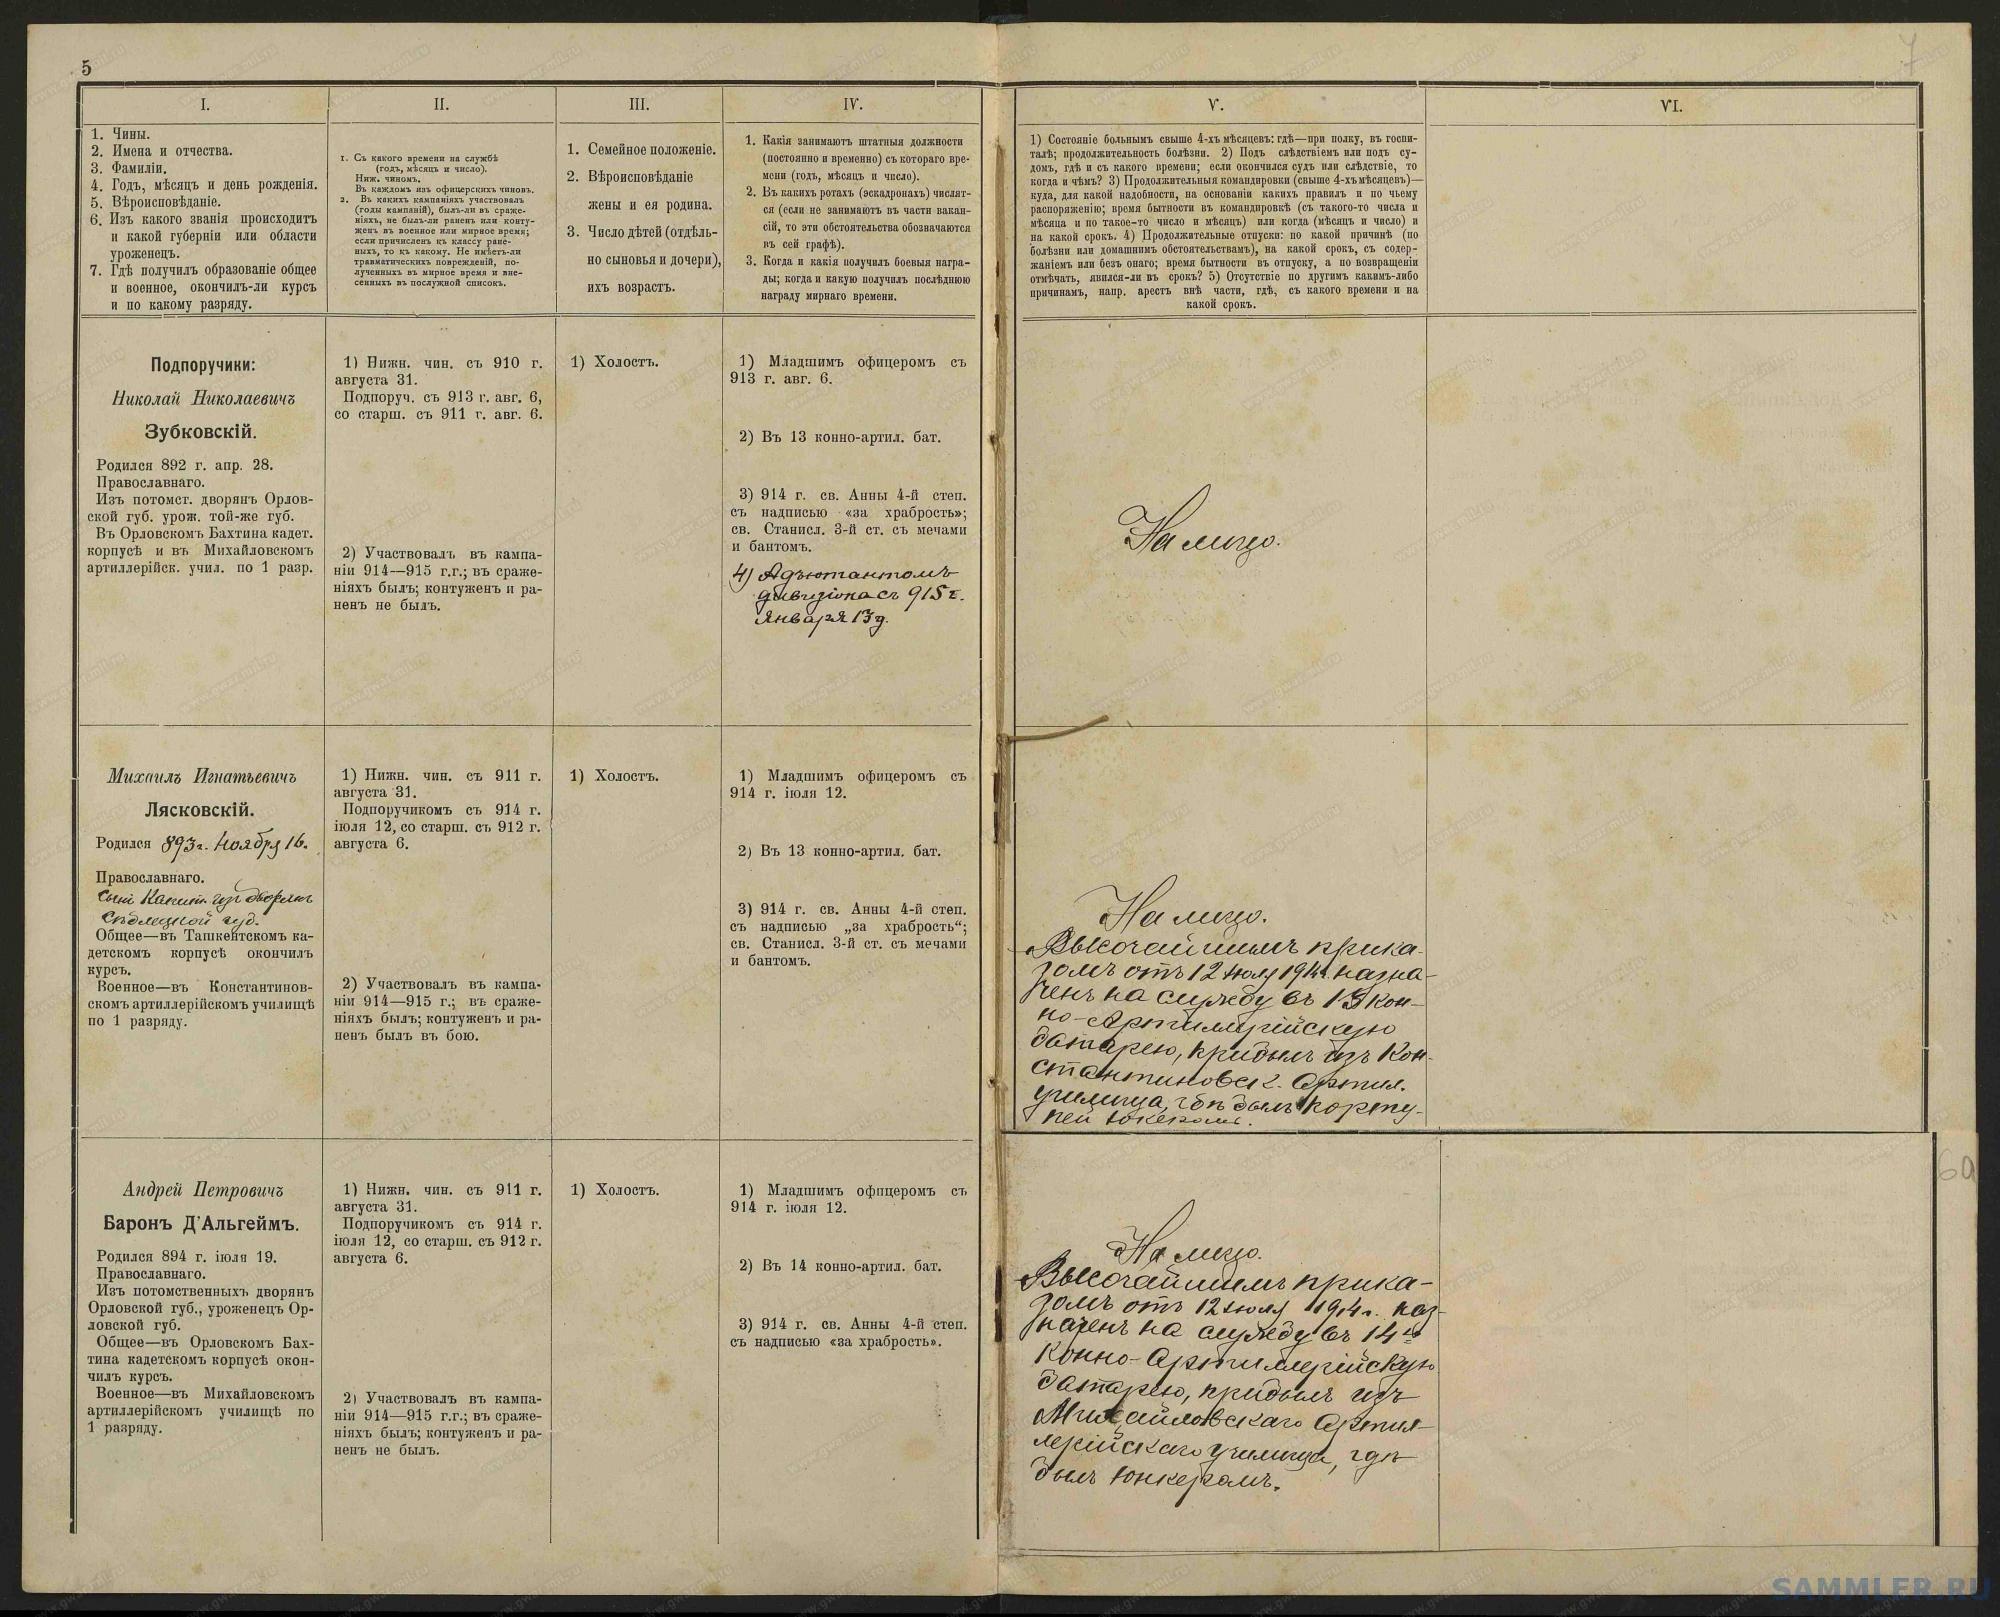 Список офицеров 7-го конно-артиллерийского дивизиона на 01.01.1915__08_.jpg